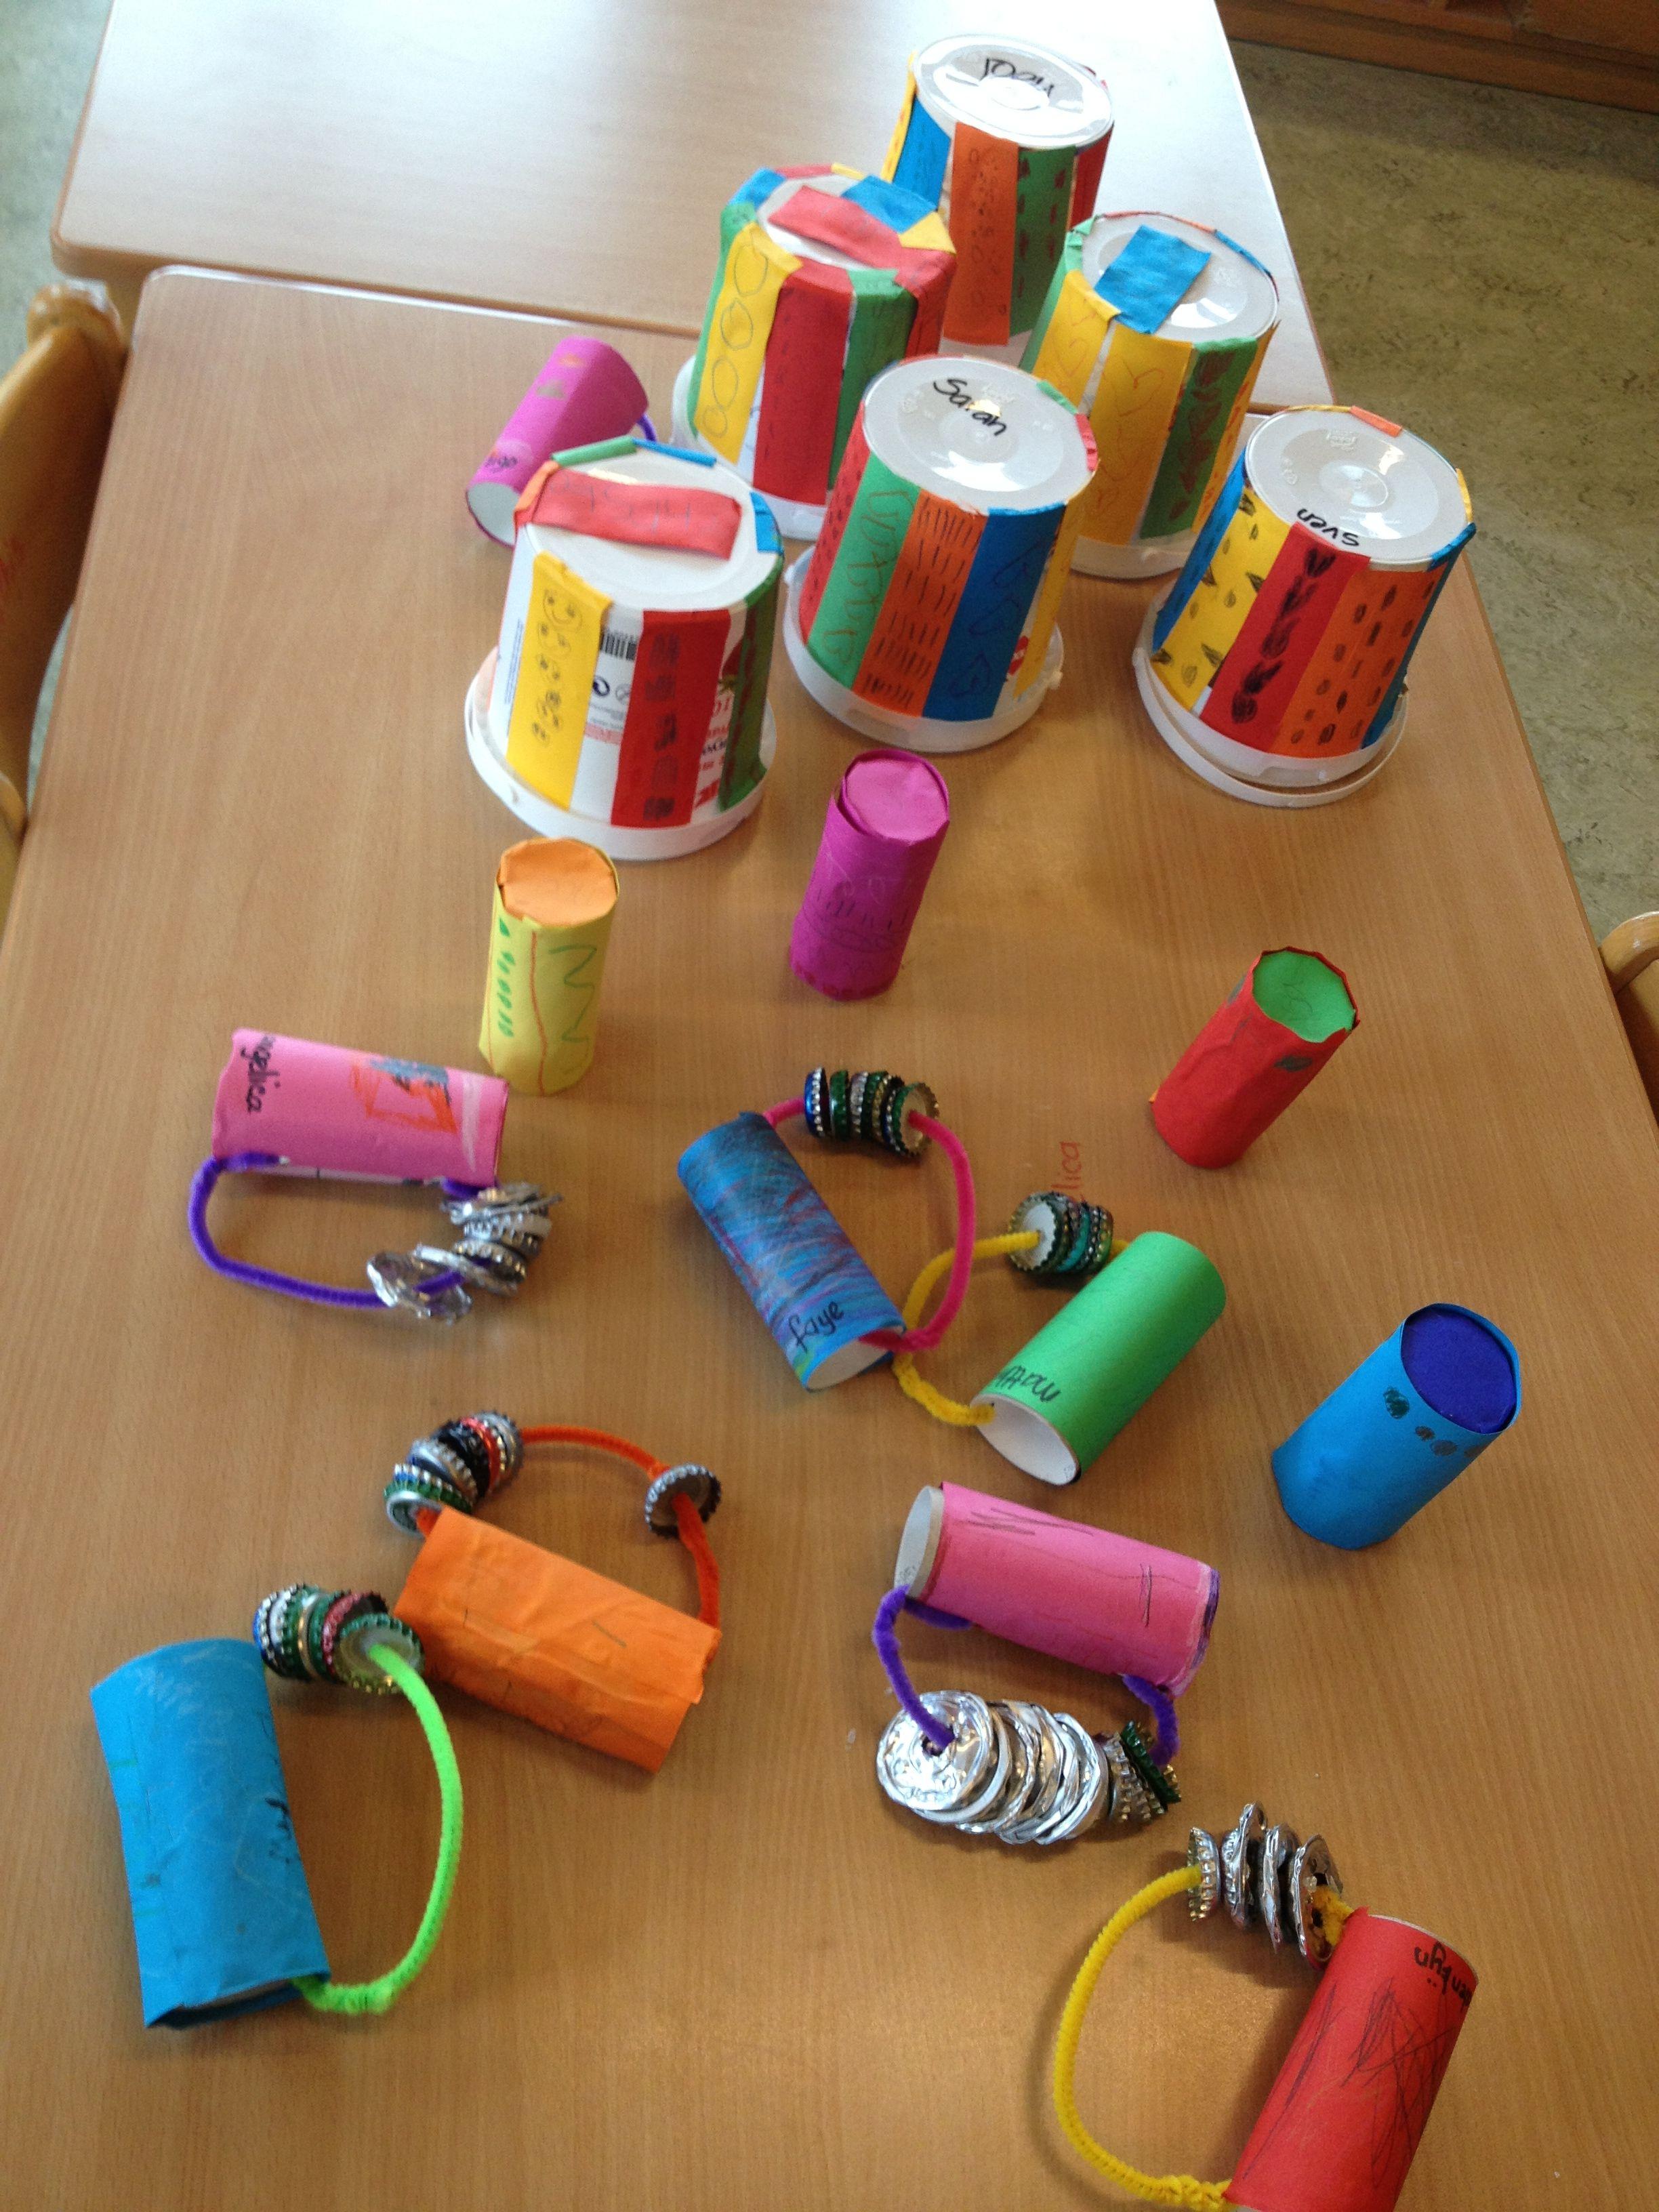 muziekinstrumenten - musical instruments made from recycled